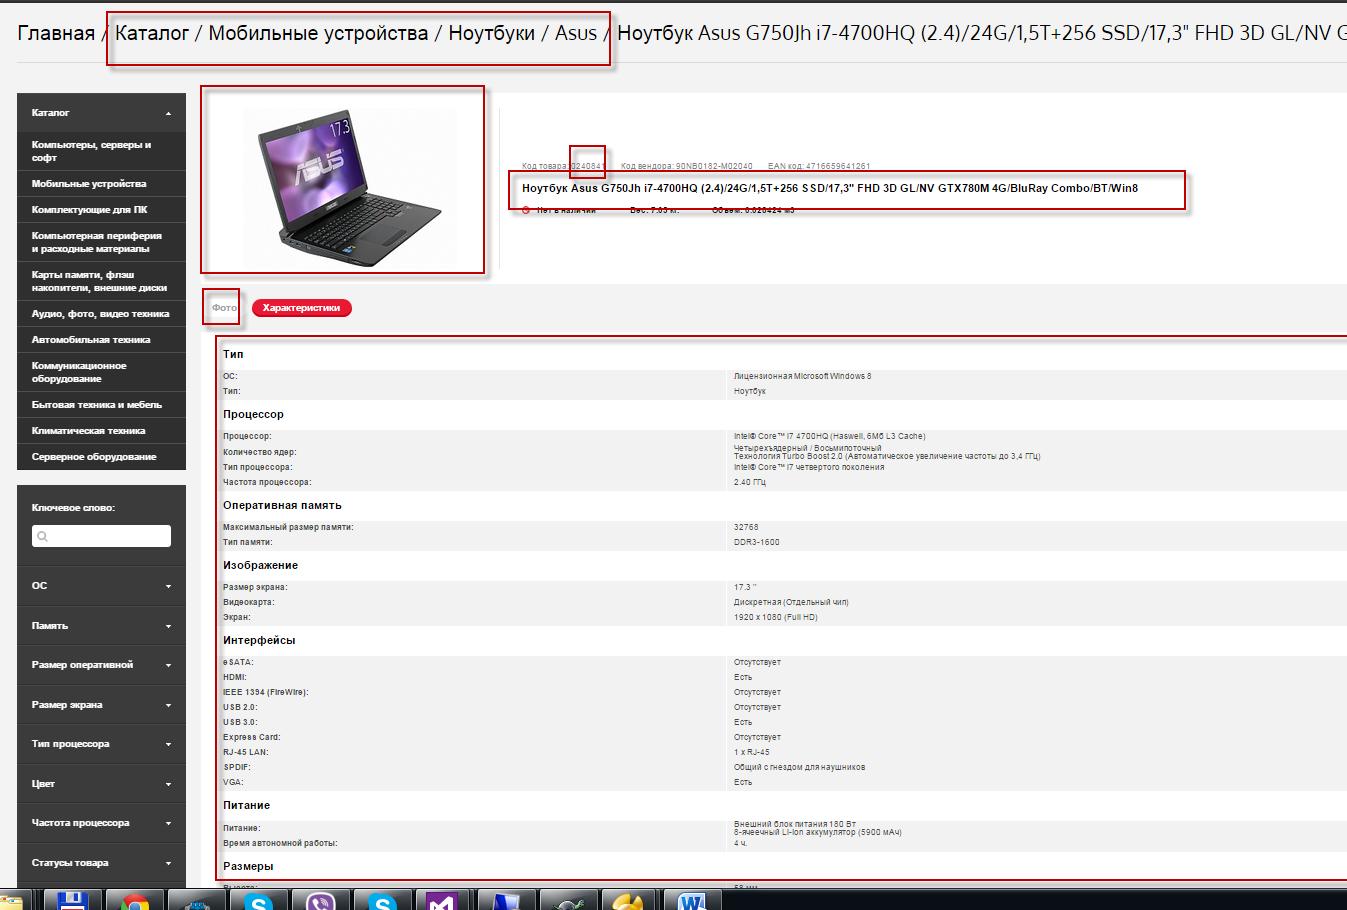 Наполнение магазина товарами staten.ru